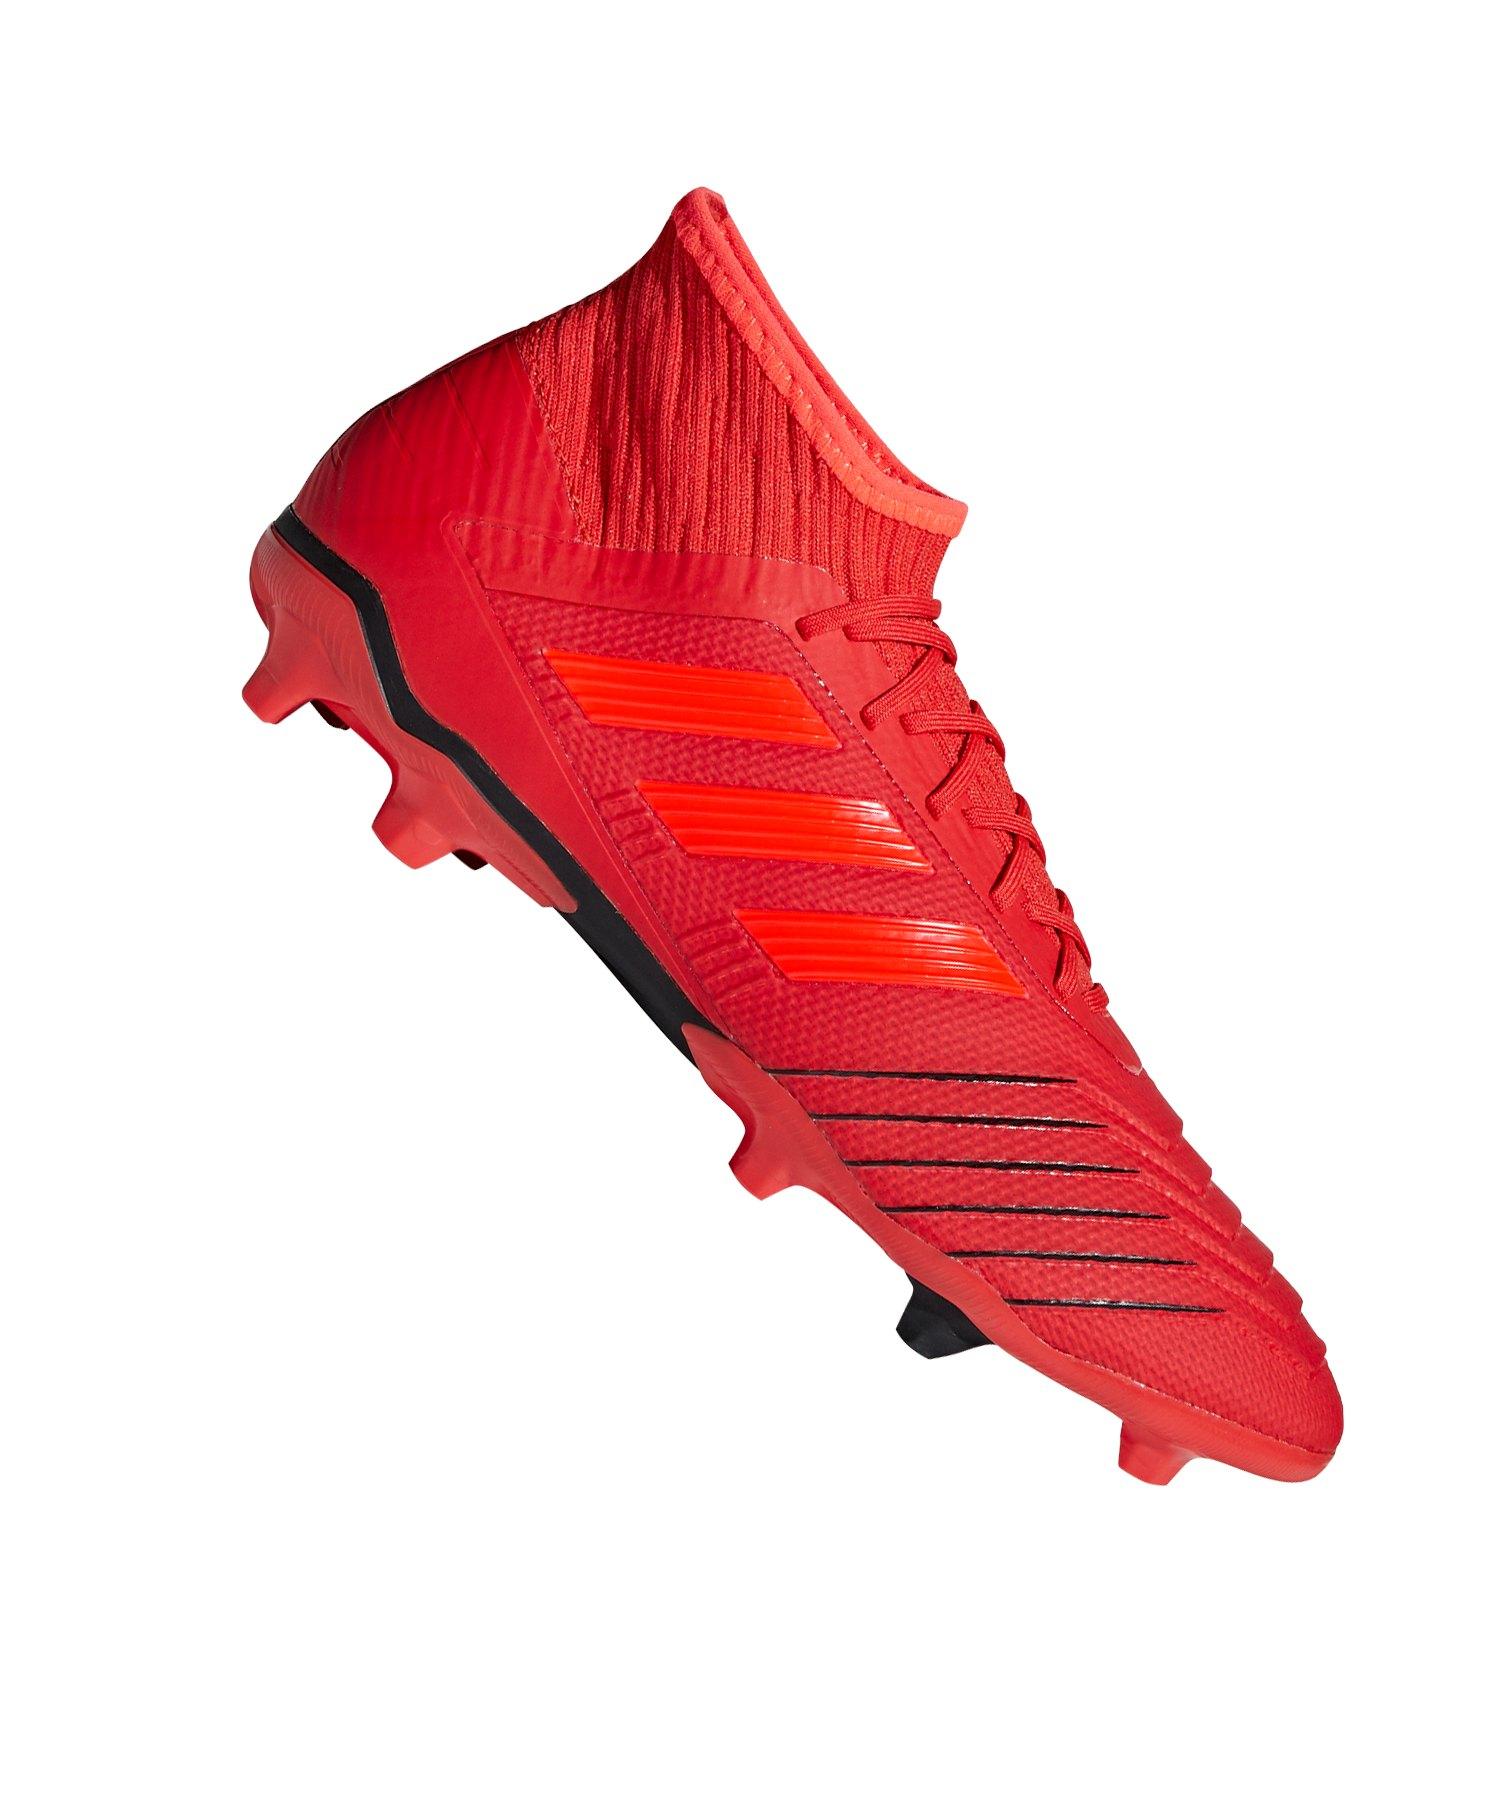 adidas Predator 19.2 FG Rot Schwarz - rot